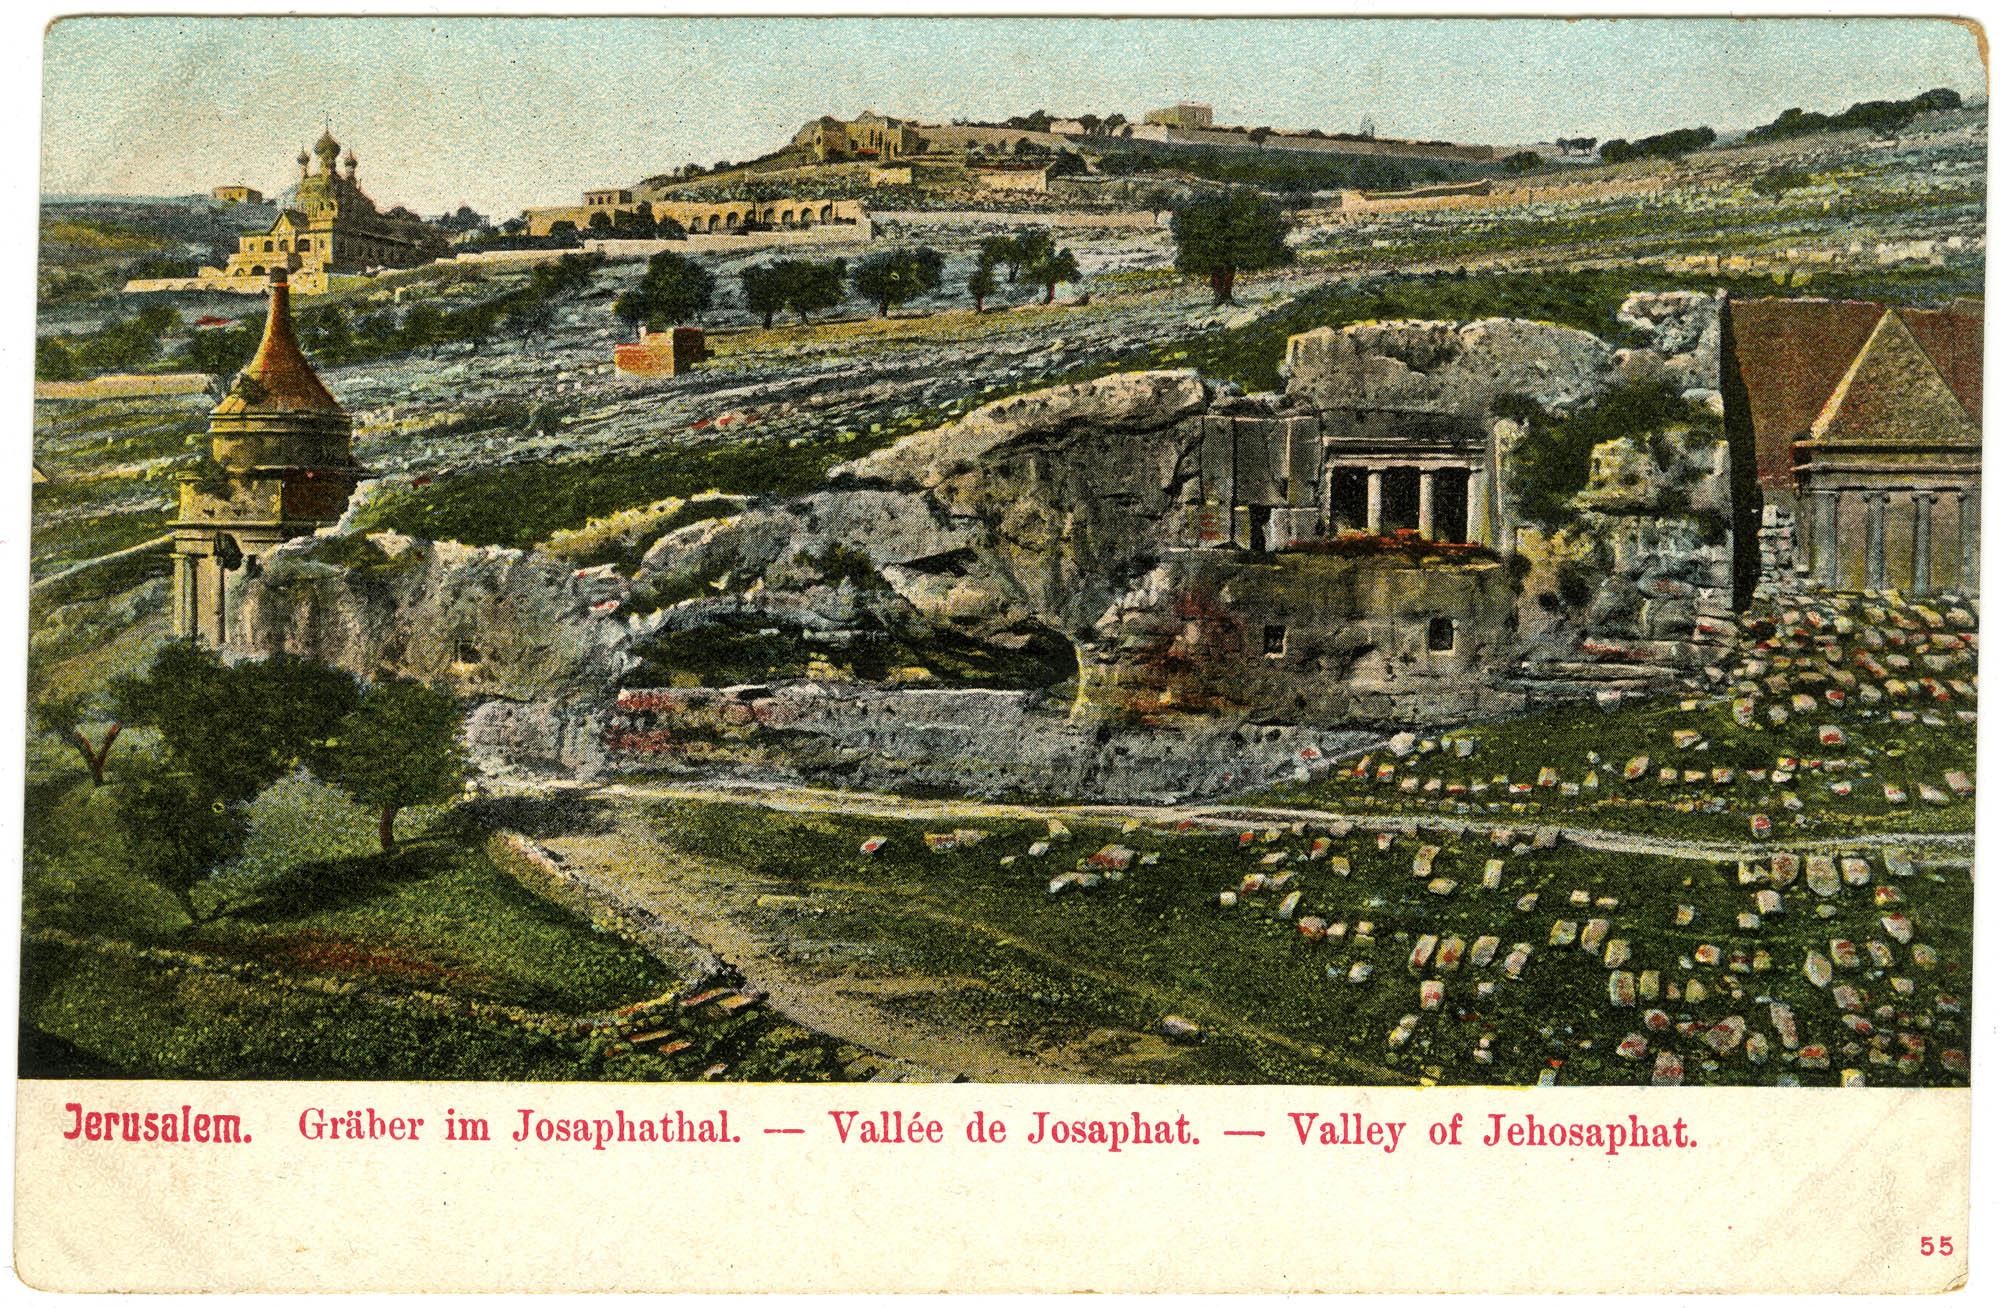 Jerusalem. Gräber im Josaphathal. / Vallée de Josaphat. / Valley of Jehoshaphat.